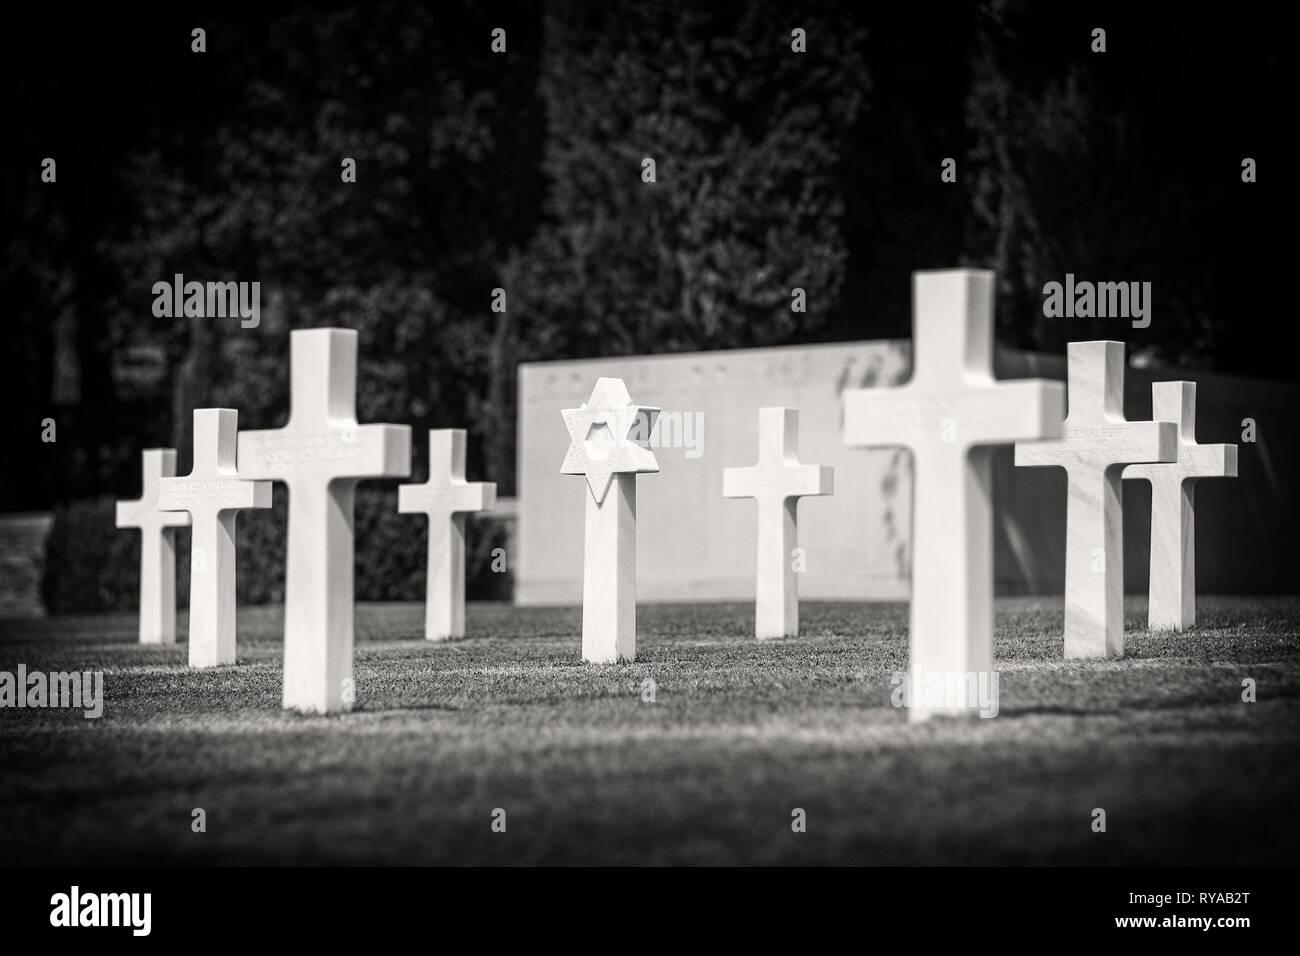 Grabkreuze auf dem Friedhof in Rhone American Cemetery and Memorial, Draguignan, Frankreich, 30.08.2018 Bildnachweis: Mario Hommes / HH-Photography Stock Photo